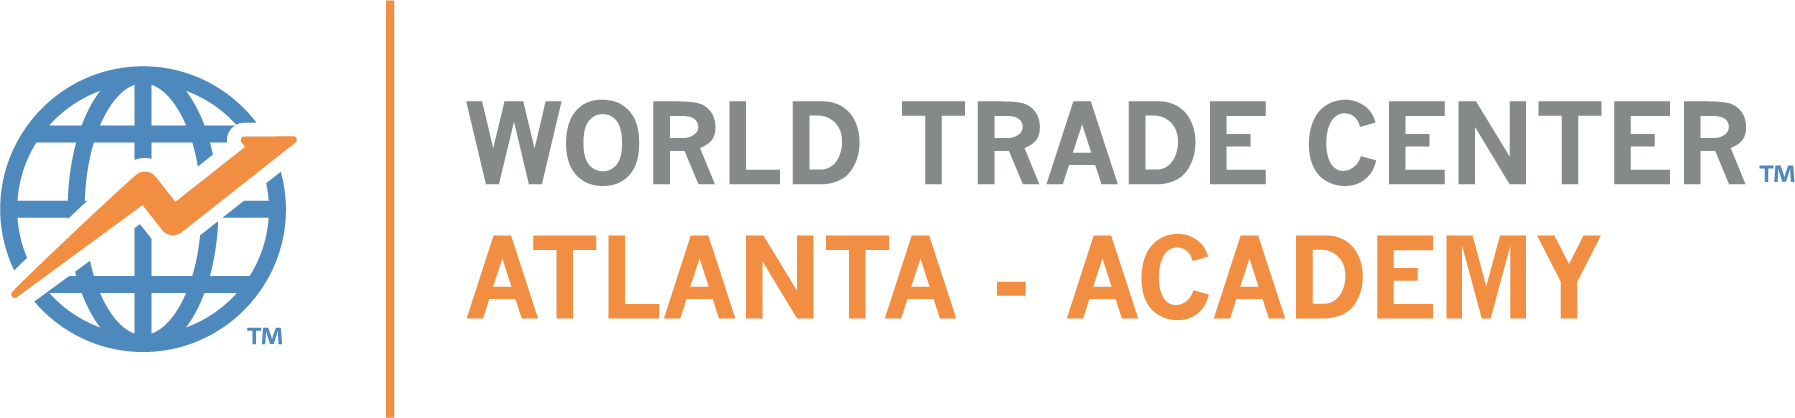 Academy World Trade Center Color Logo